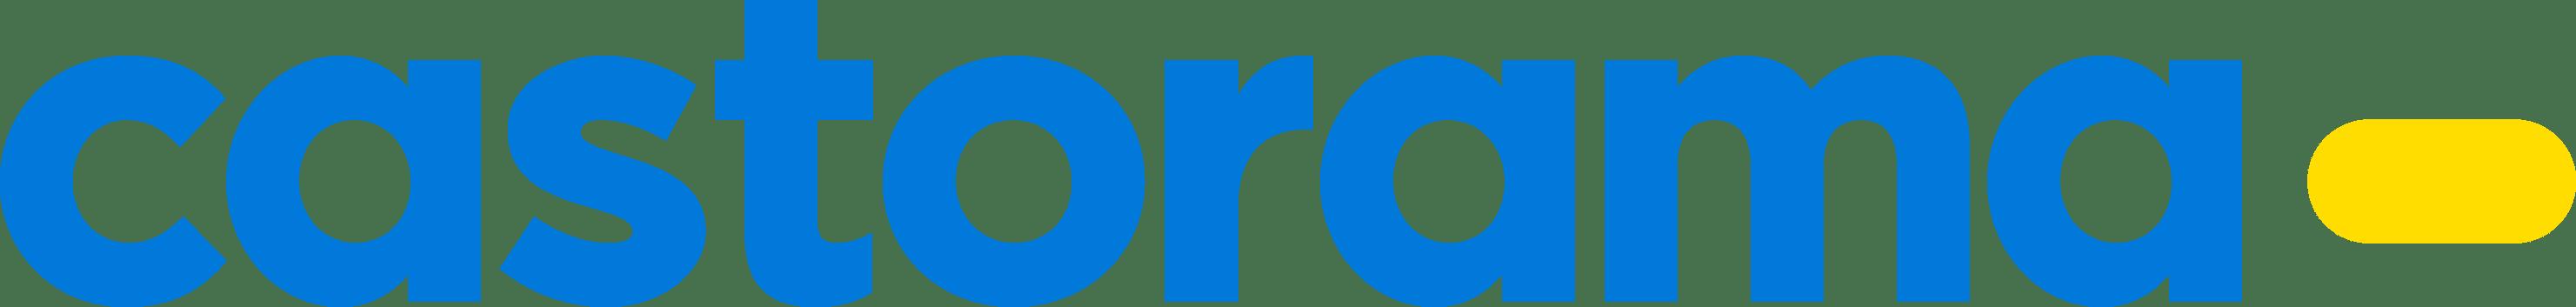 code promo castorama soldes hiver 2021